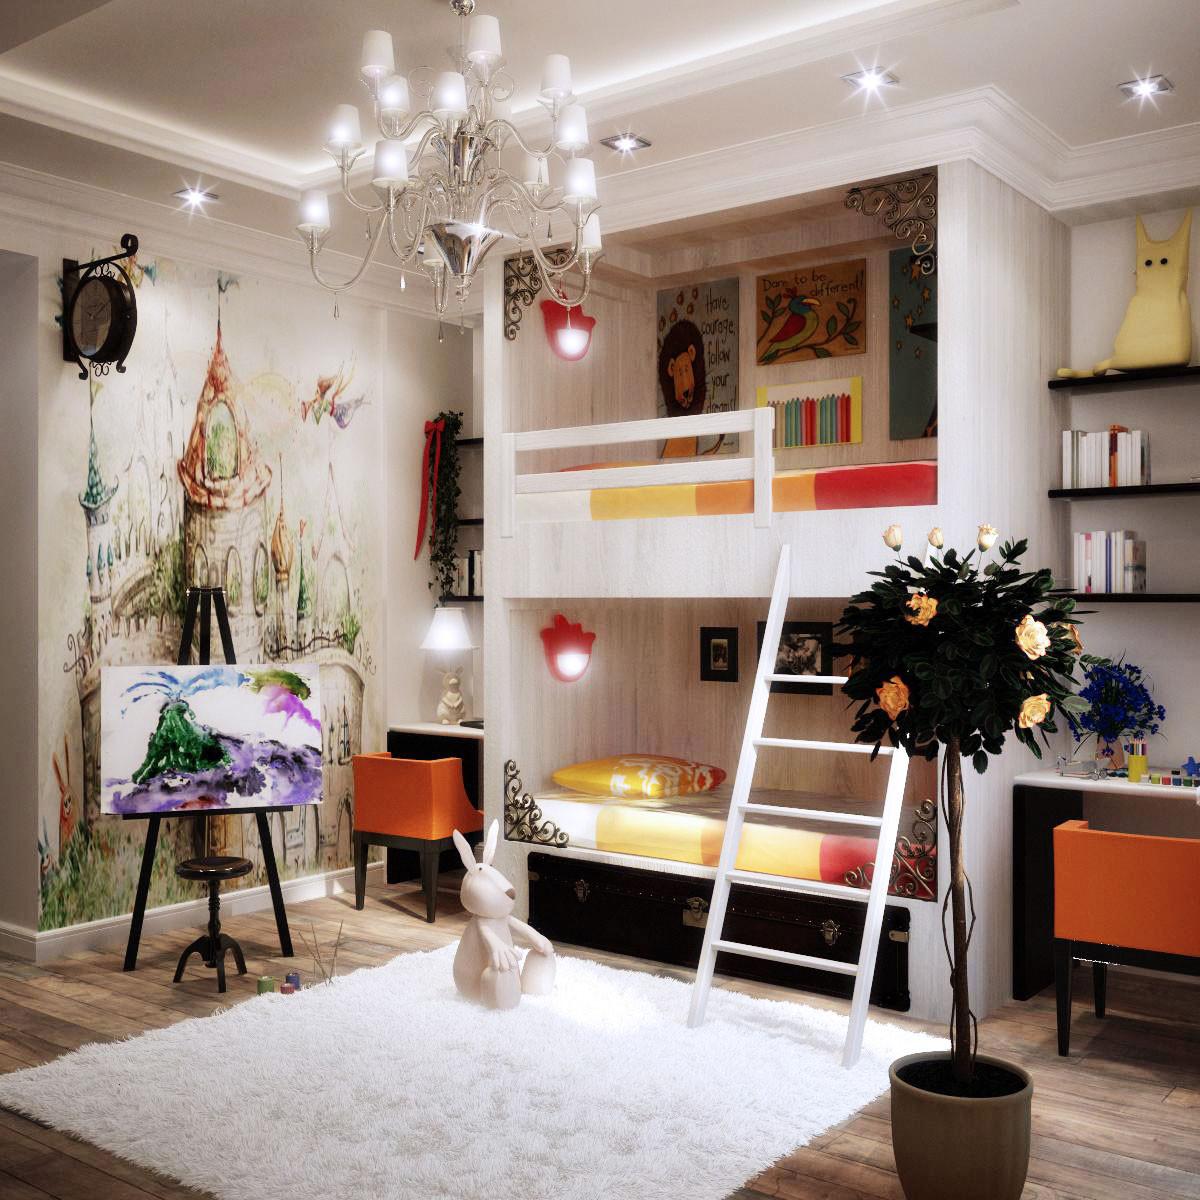 Kids Room Decor Ideas  Colorful Kids Rooms